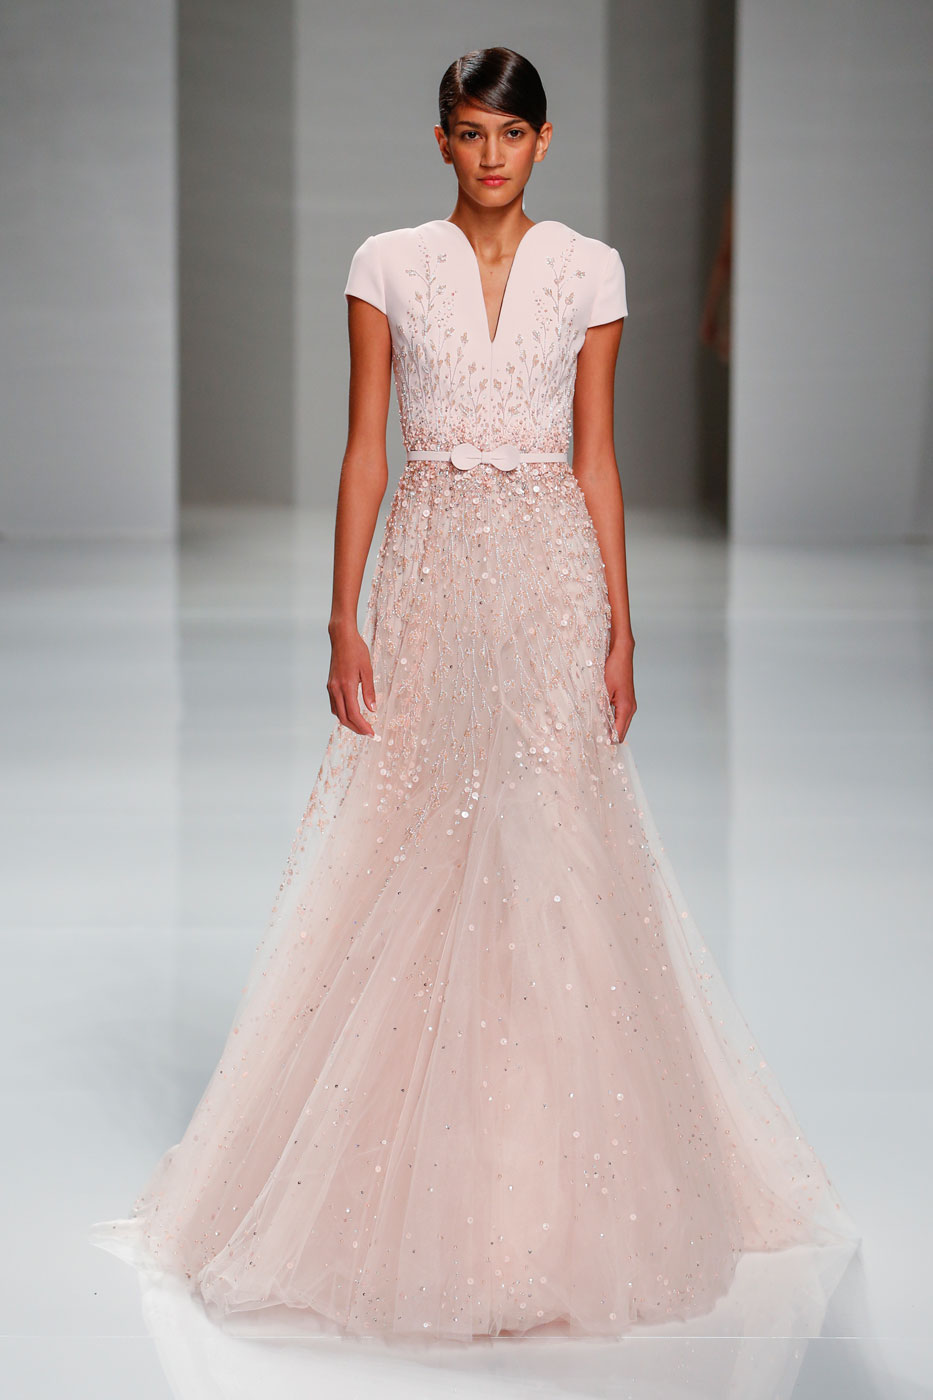 Georges-Hobeika-fashion-runway-show-haute-couture-paris-spring-2015-the-impression-51